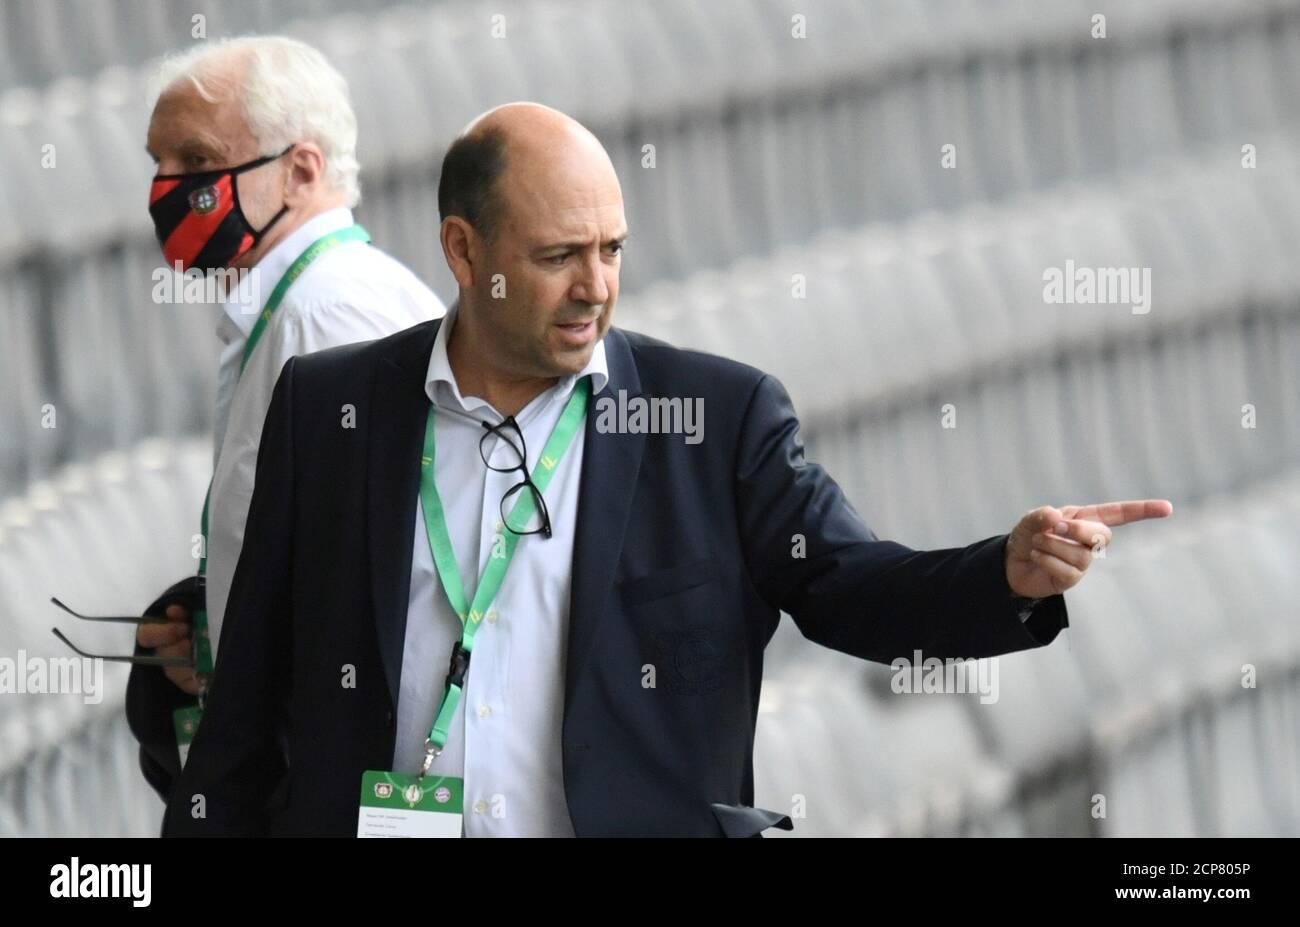 Bayer Leverkusen President Immagini e Fotos Stock - Alamy